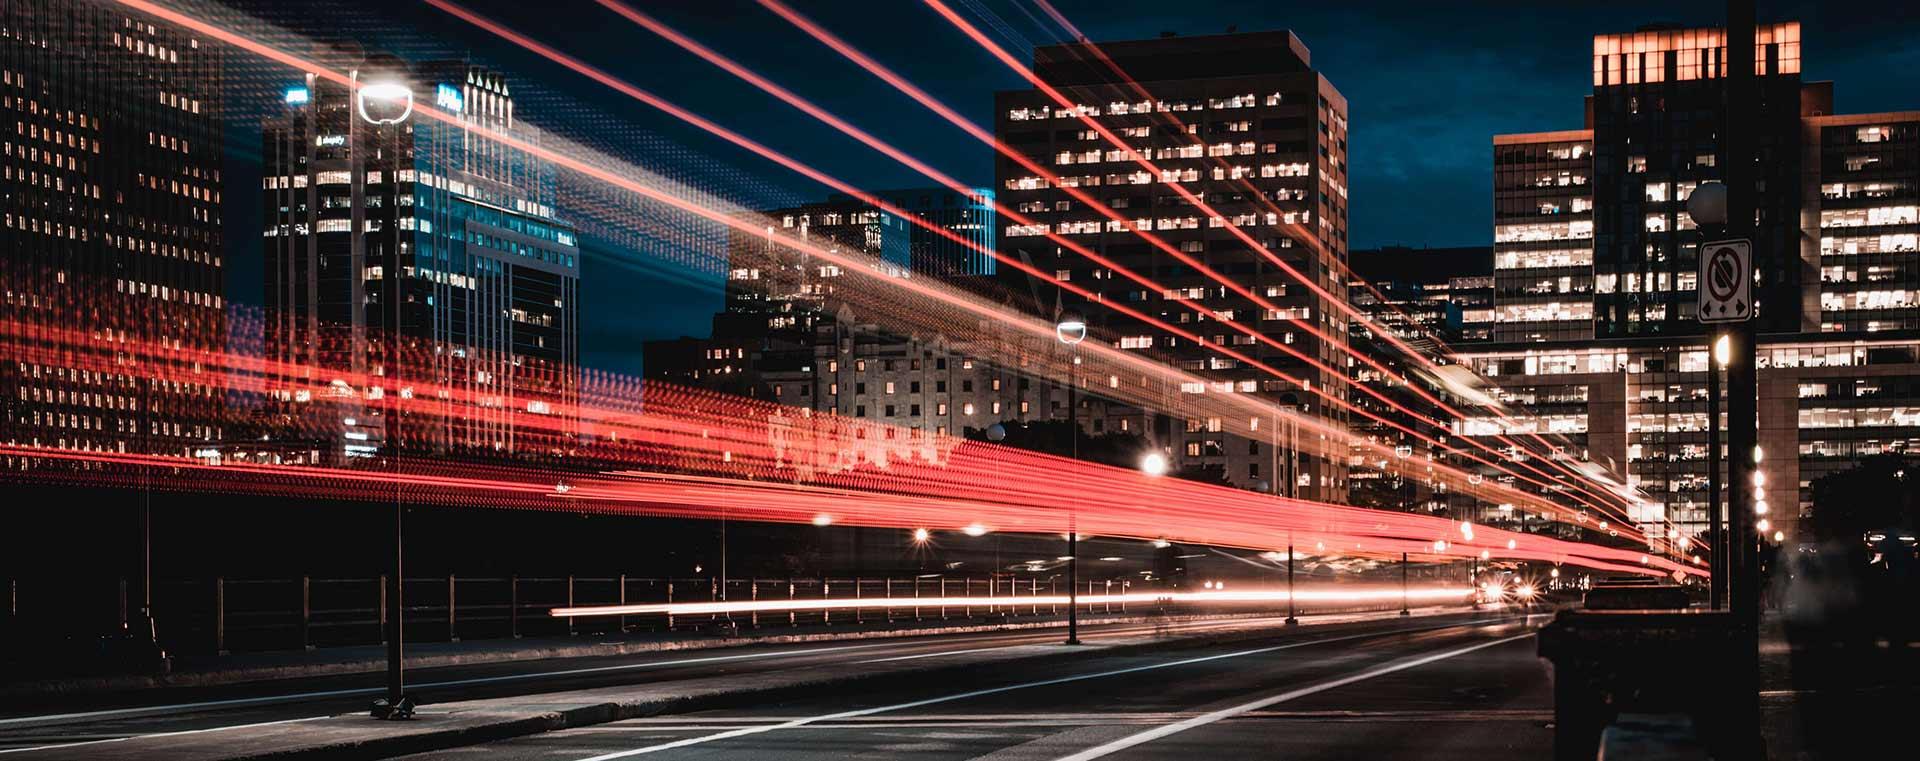 blurred-car-lights-city-night